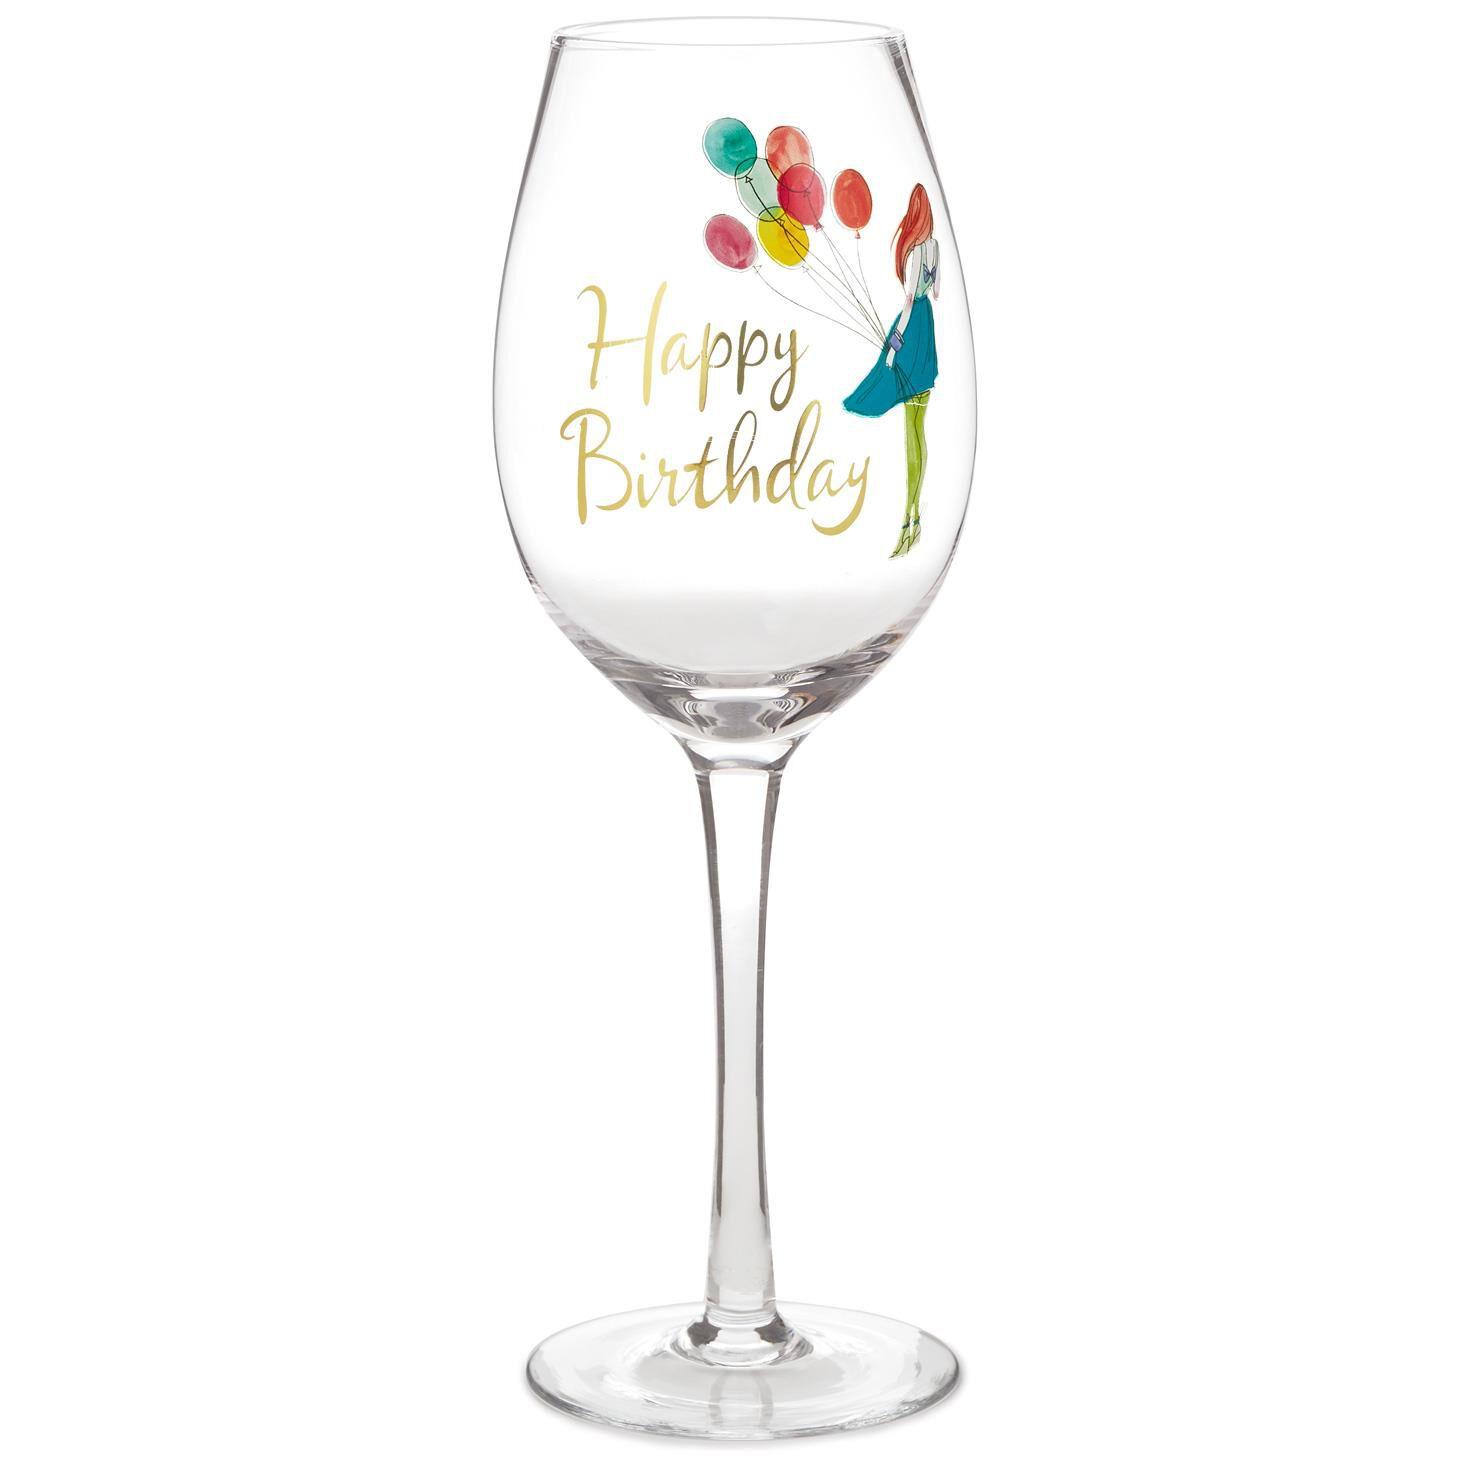 happy birthday wine glass 158 oz wine glasses hallmark - Happy Birthday Wine Glass